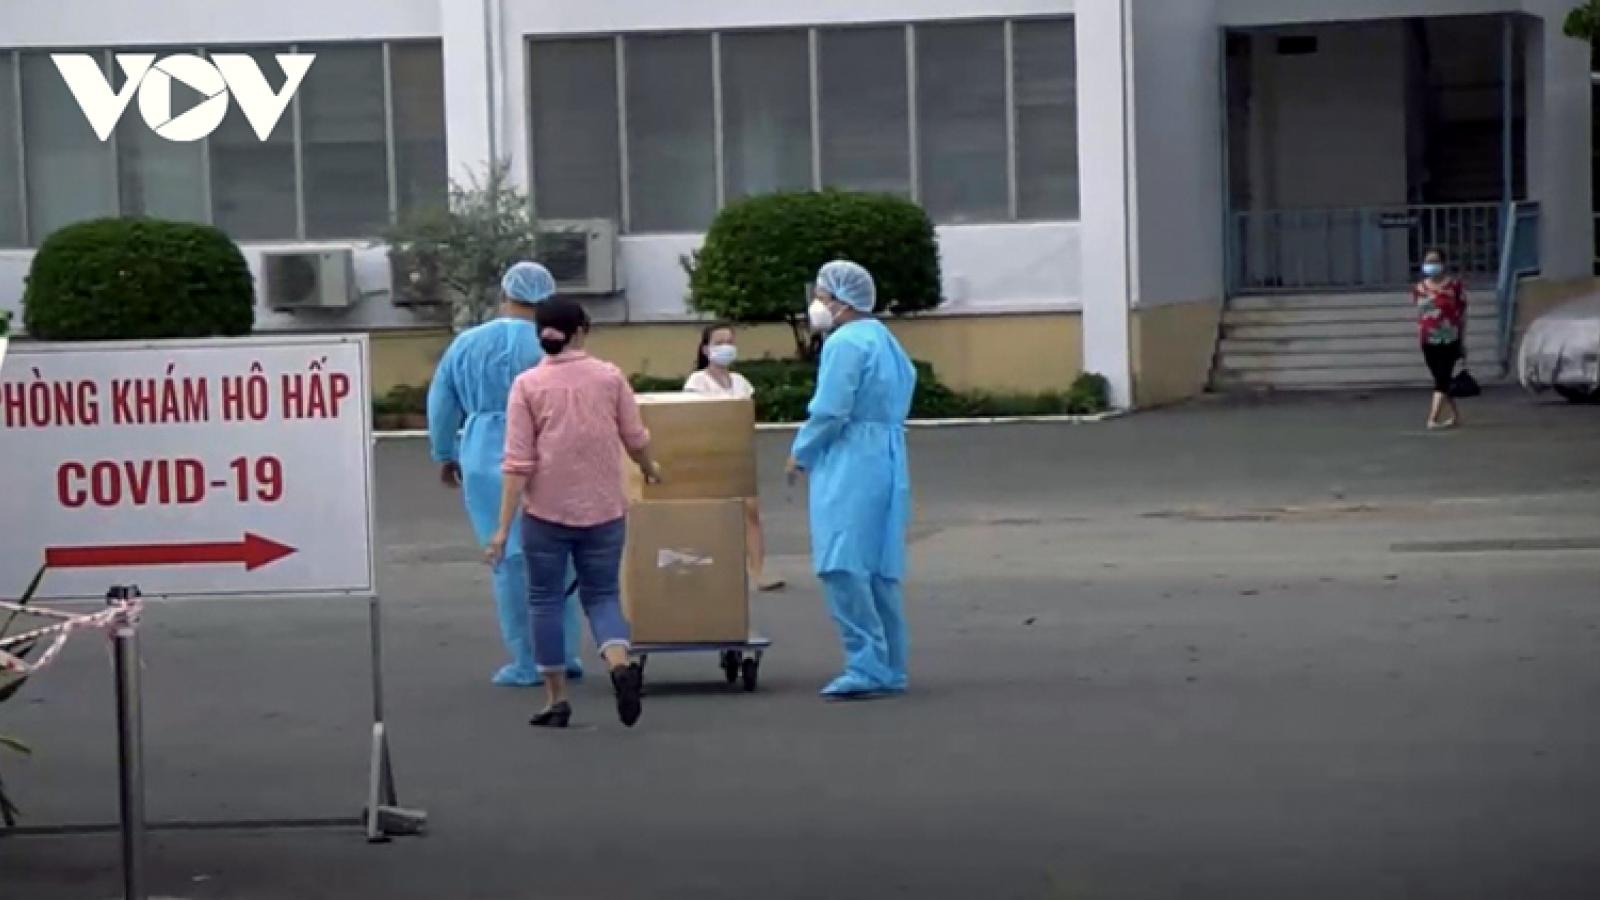 COVID-19: HCM City hospital cases rise sharply, most asymptomatic